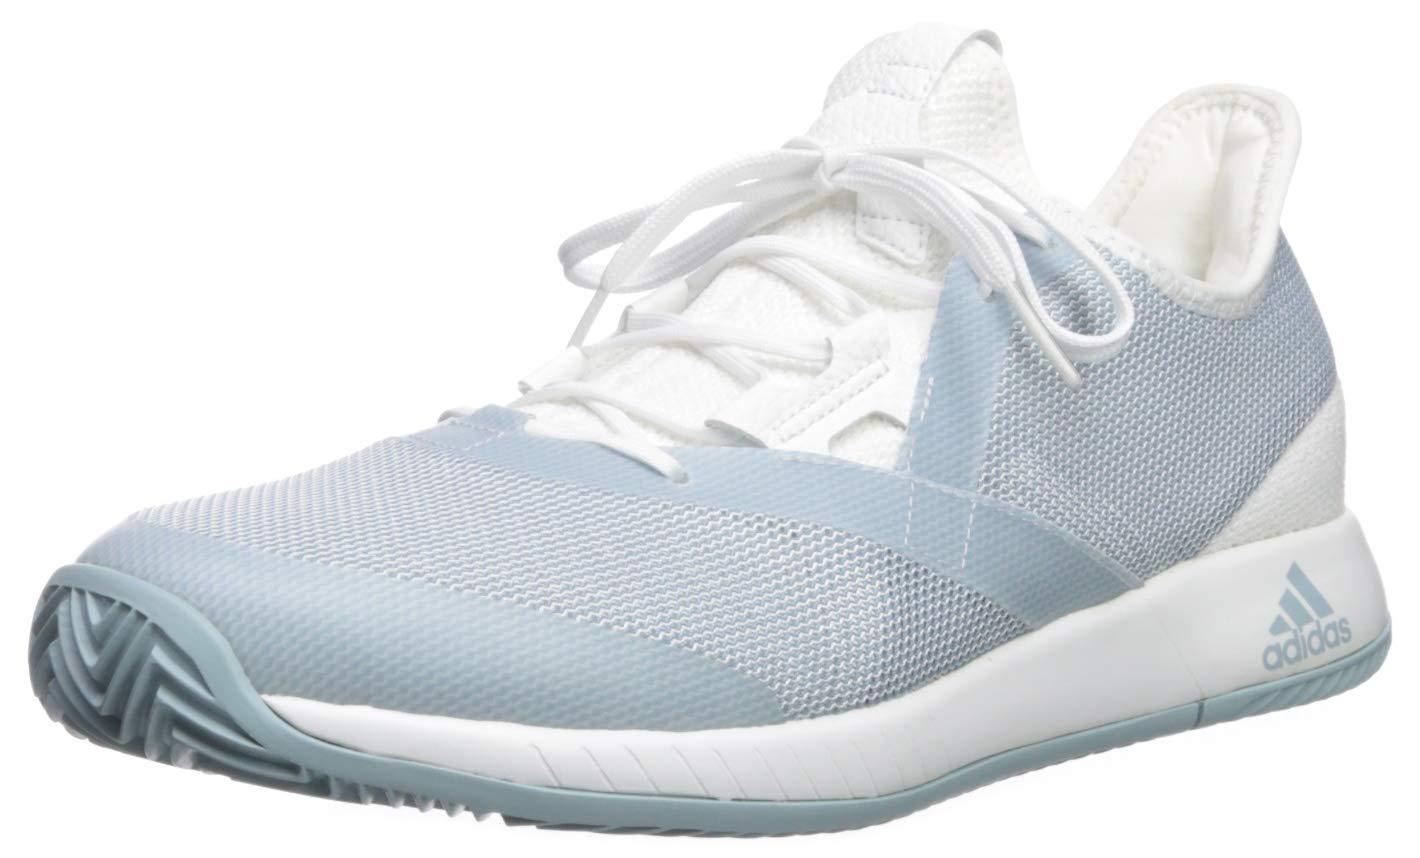 adidas Women's Adizero Defiant Bounce, ash Grey/White, 5.5 M US by adidas (Image #1)